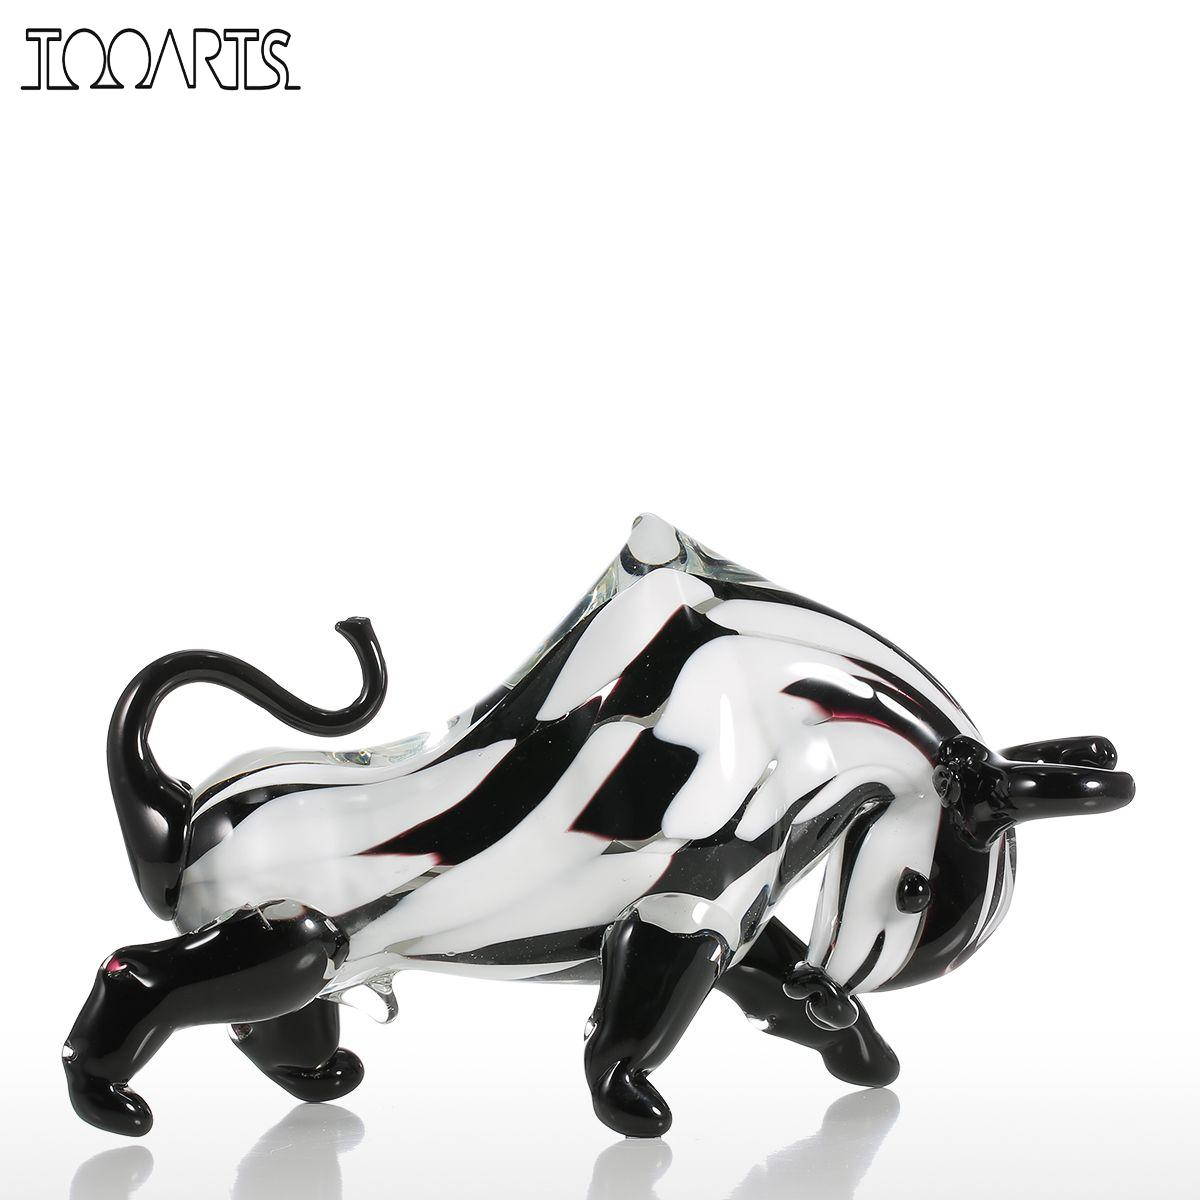 Tooarts Black White Cattle Glass Sculpture Home Decor statue modern Animal Ornament Gift Craft Decoration Bull